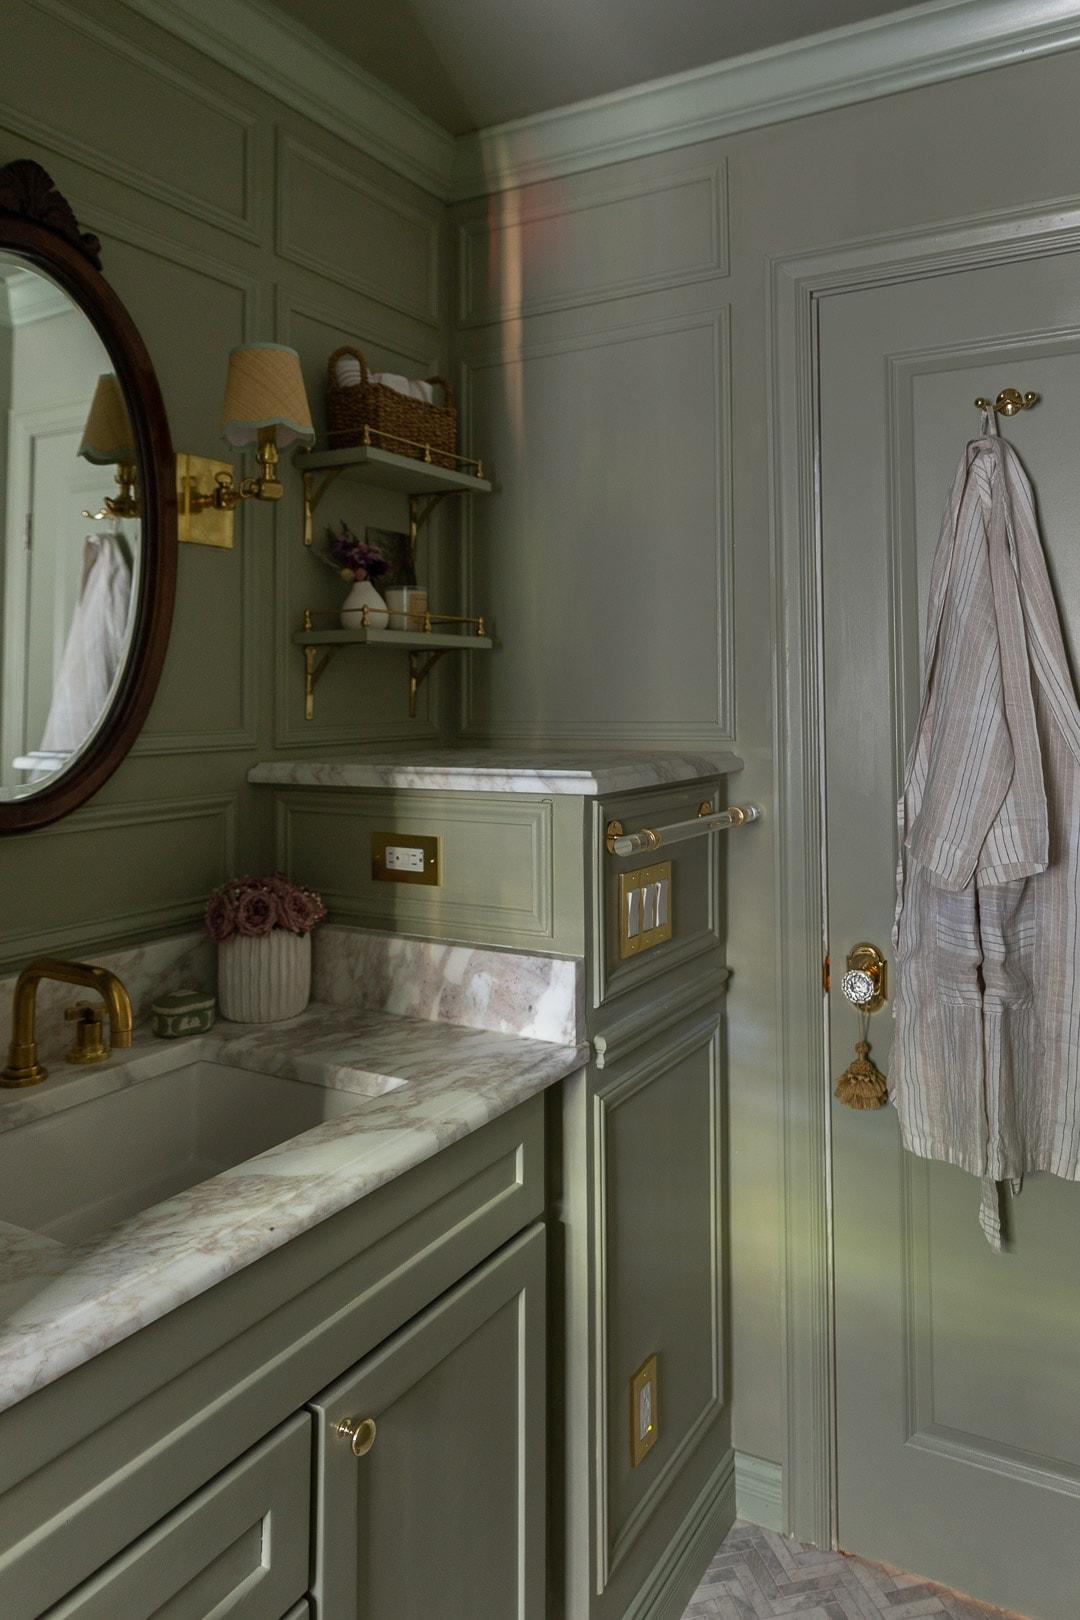 modern-traditional-bathroom-vanity-build-com-one-room-challenge